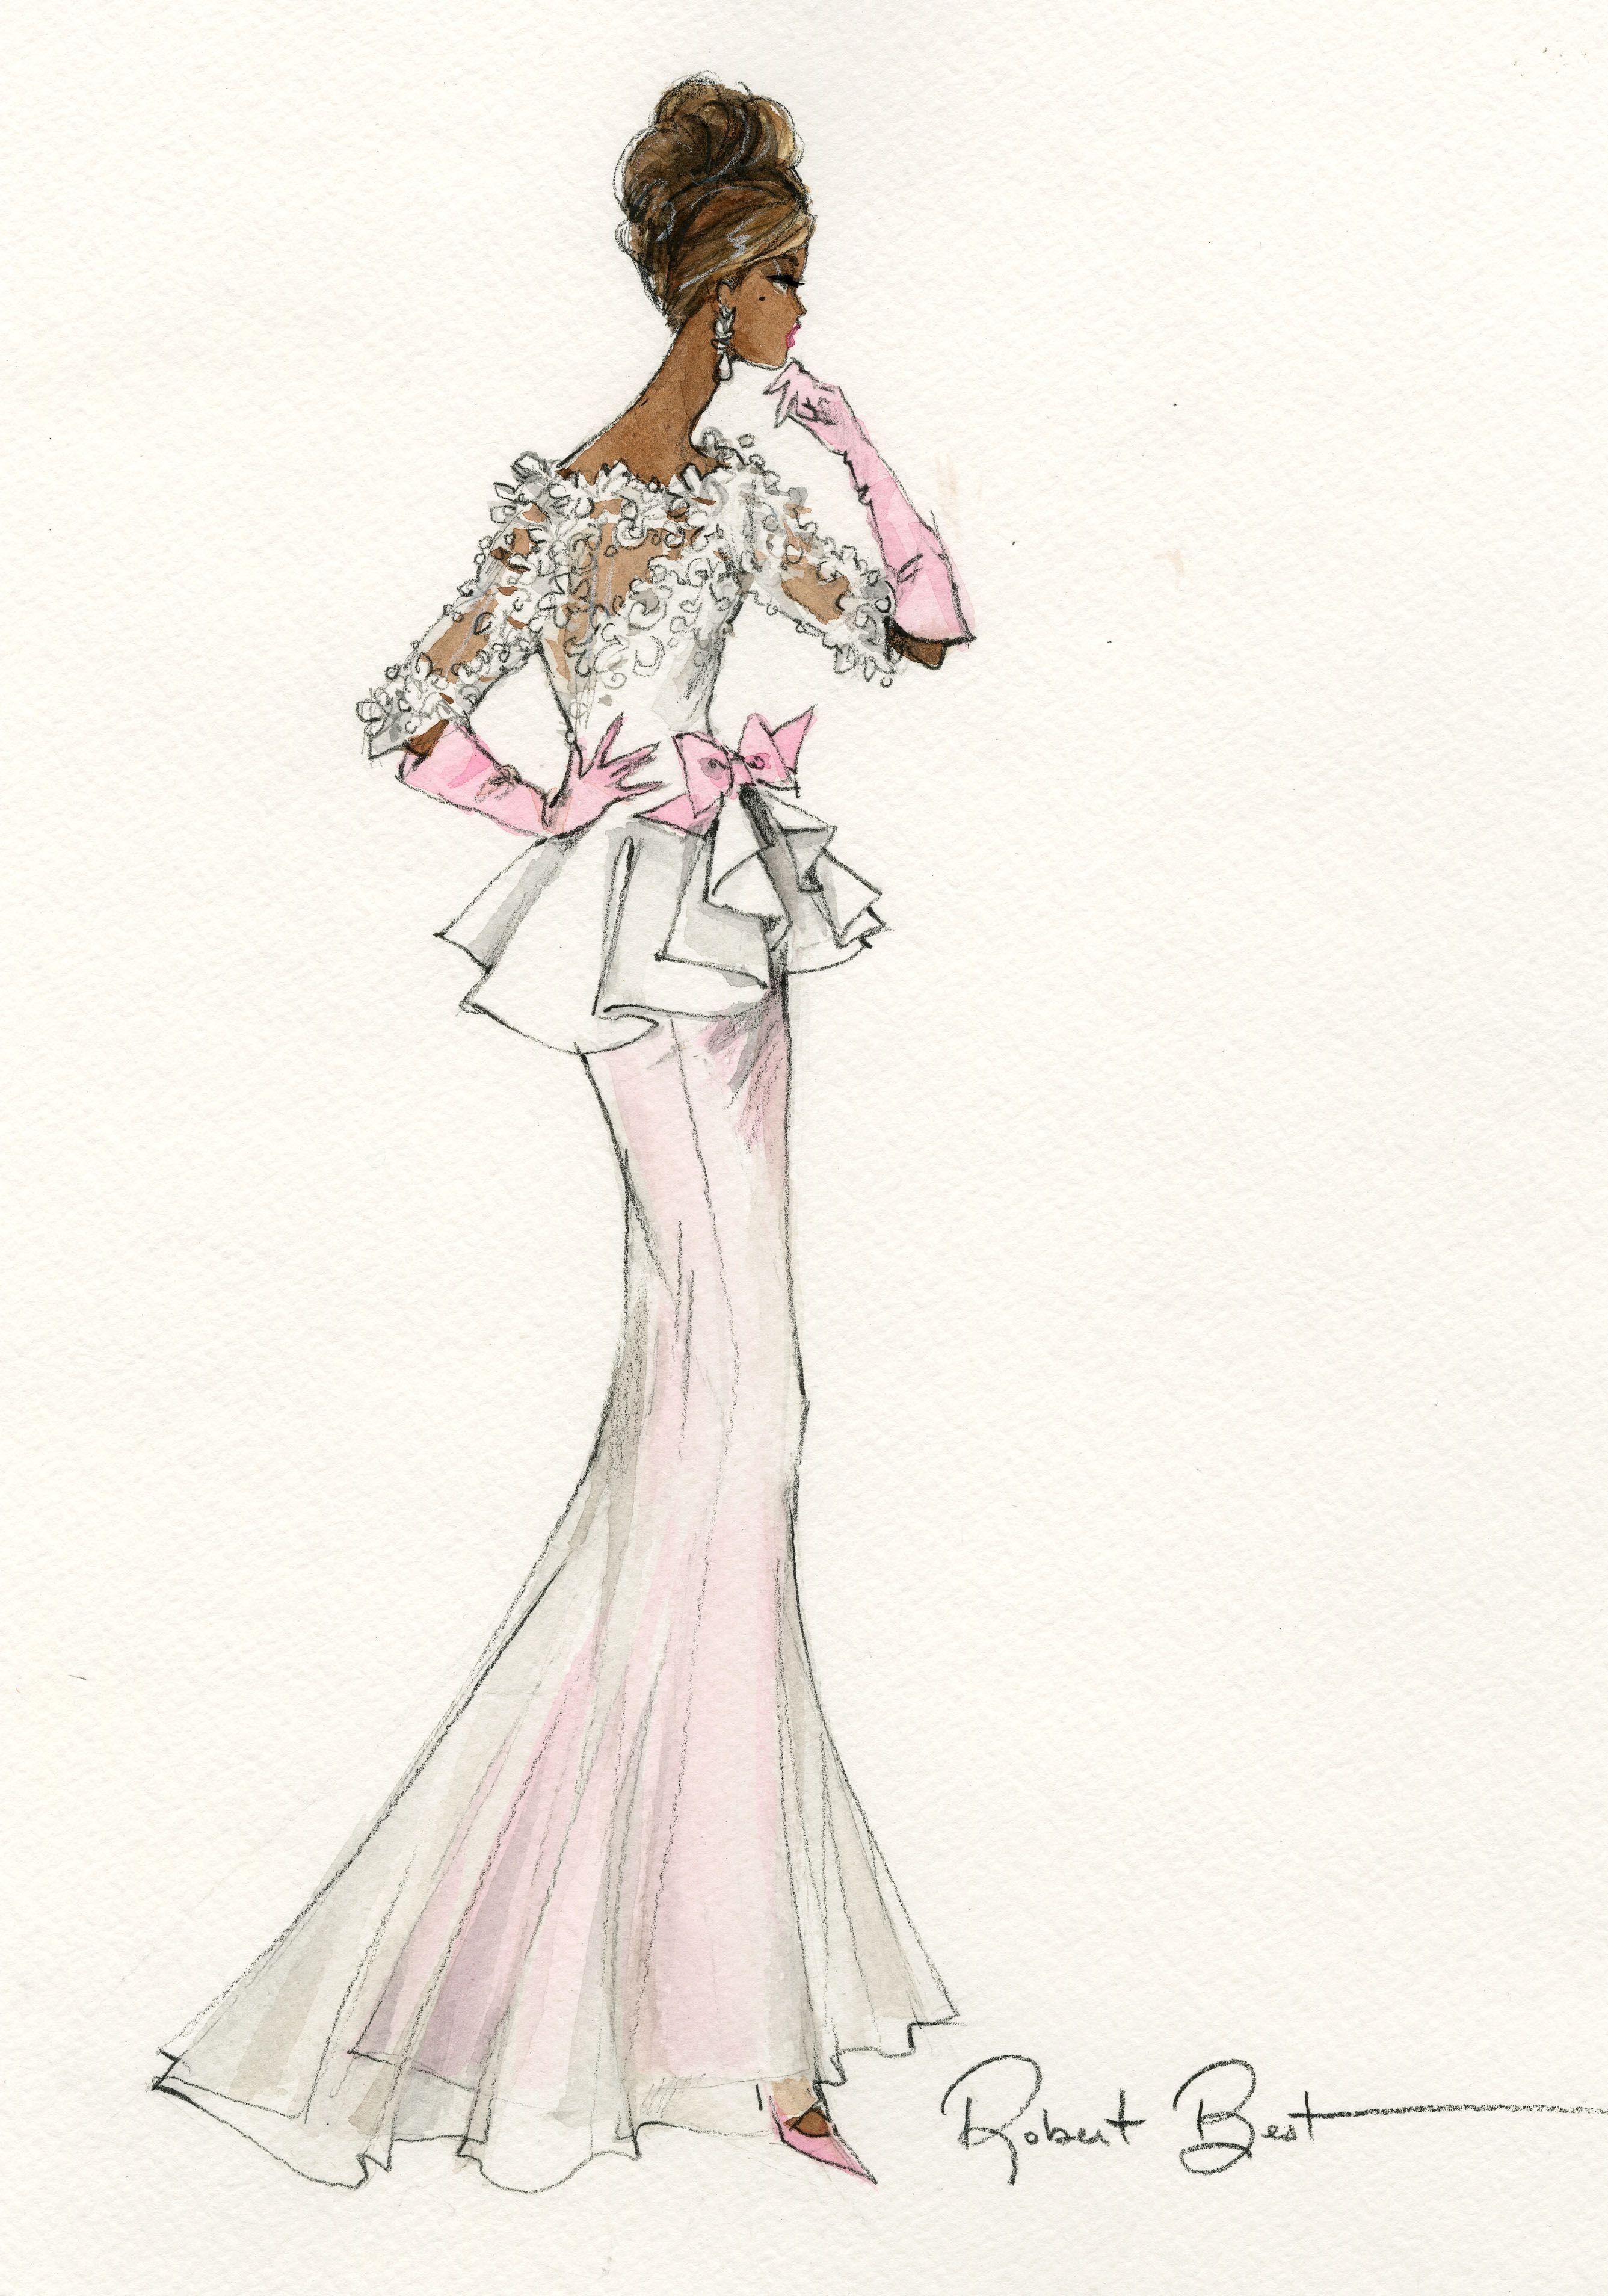 Barbie Dress Drawing Easy H Nichols Illustration Figurines Pinterest